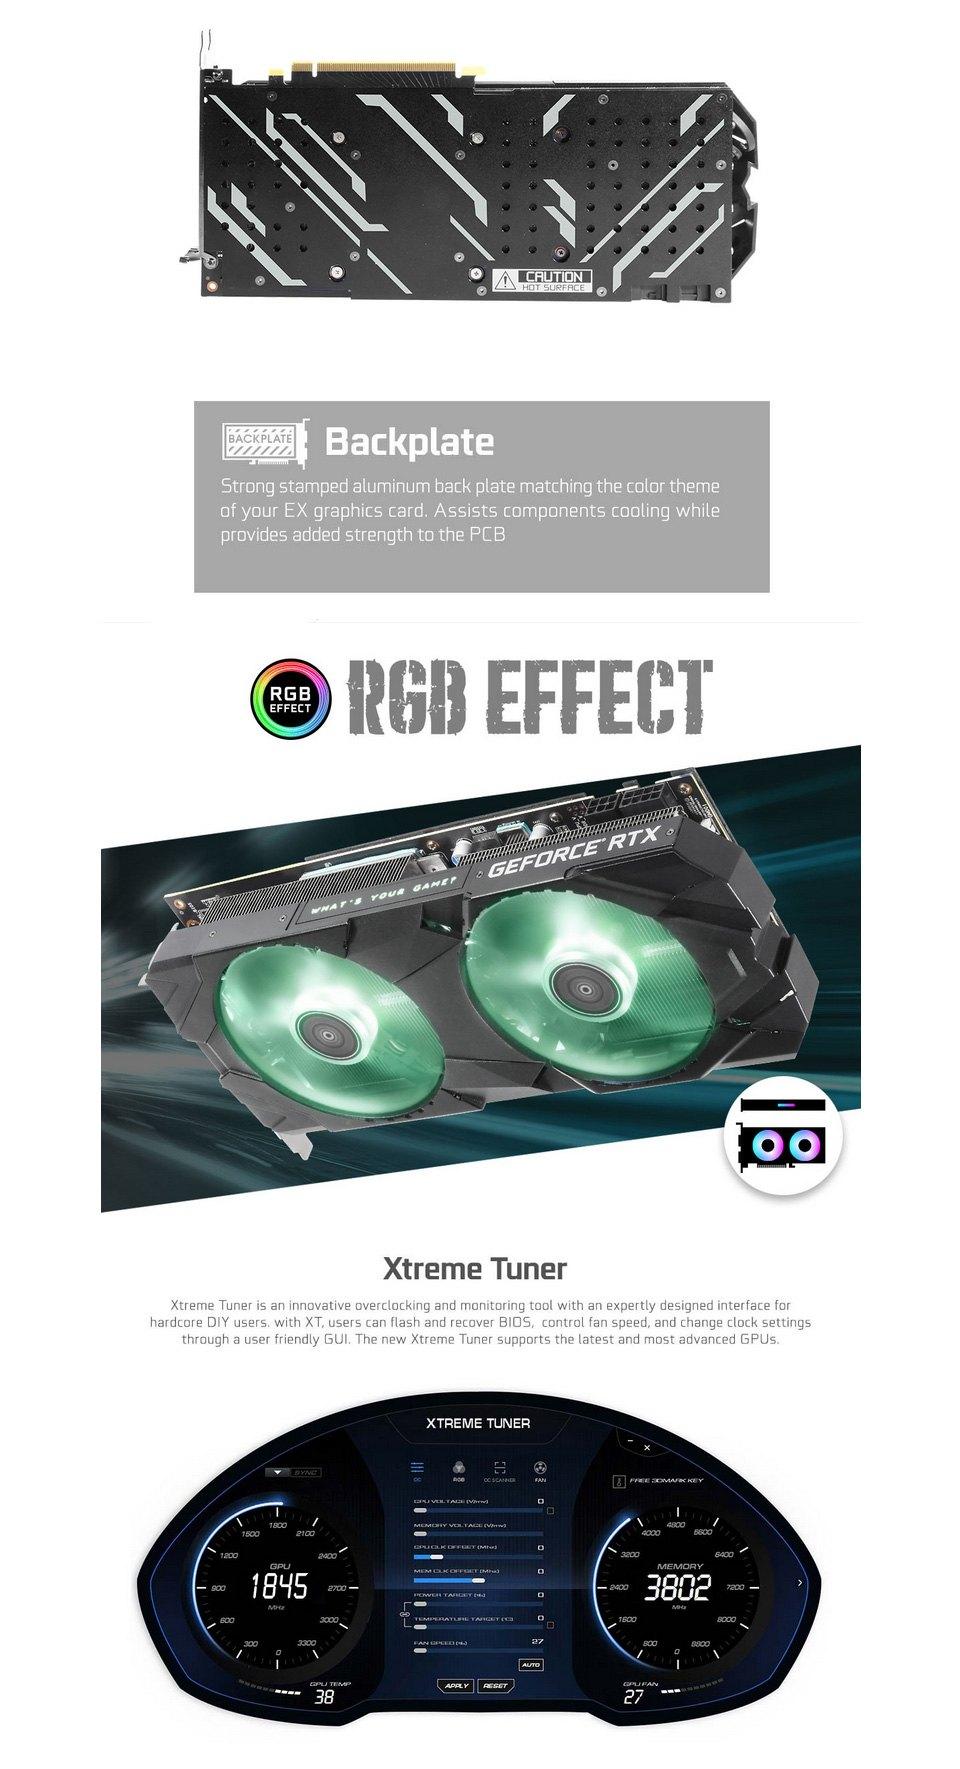 Galax GeForce RTX 2080 Super EX (1-Click OC) 8GB features 2